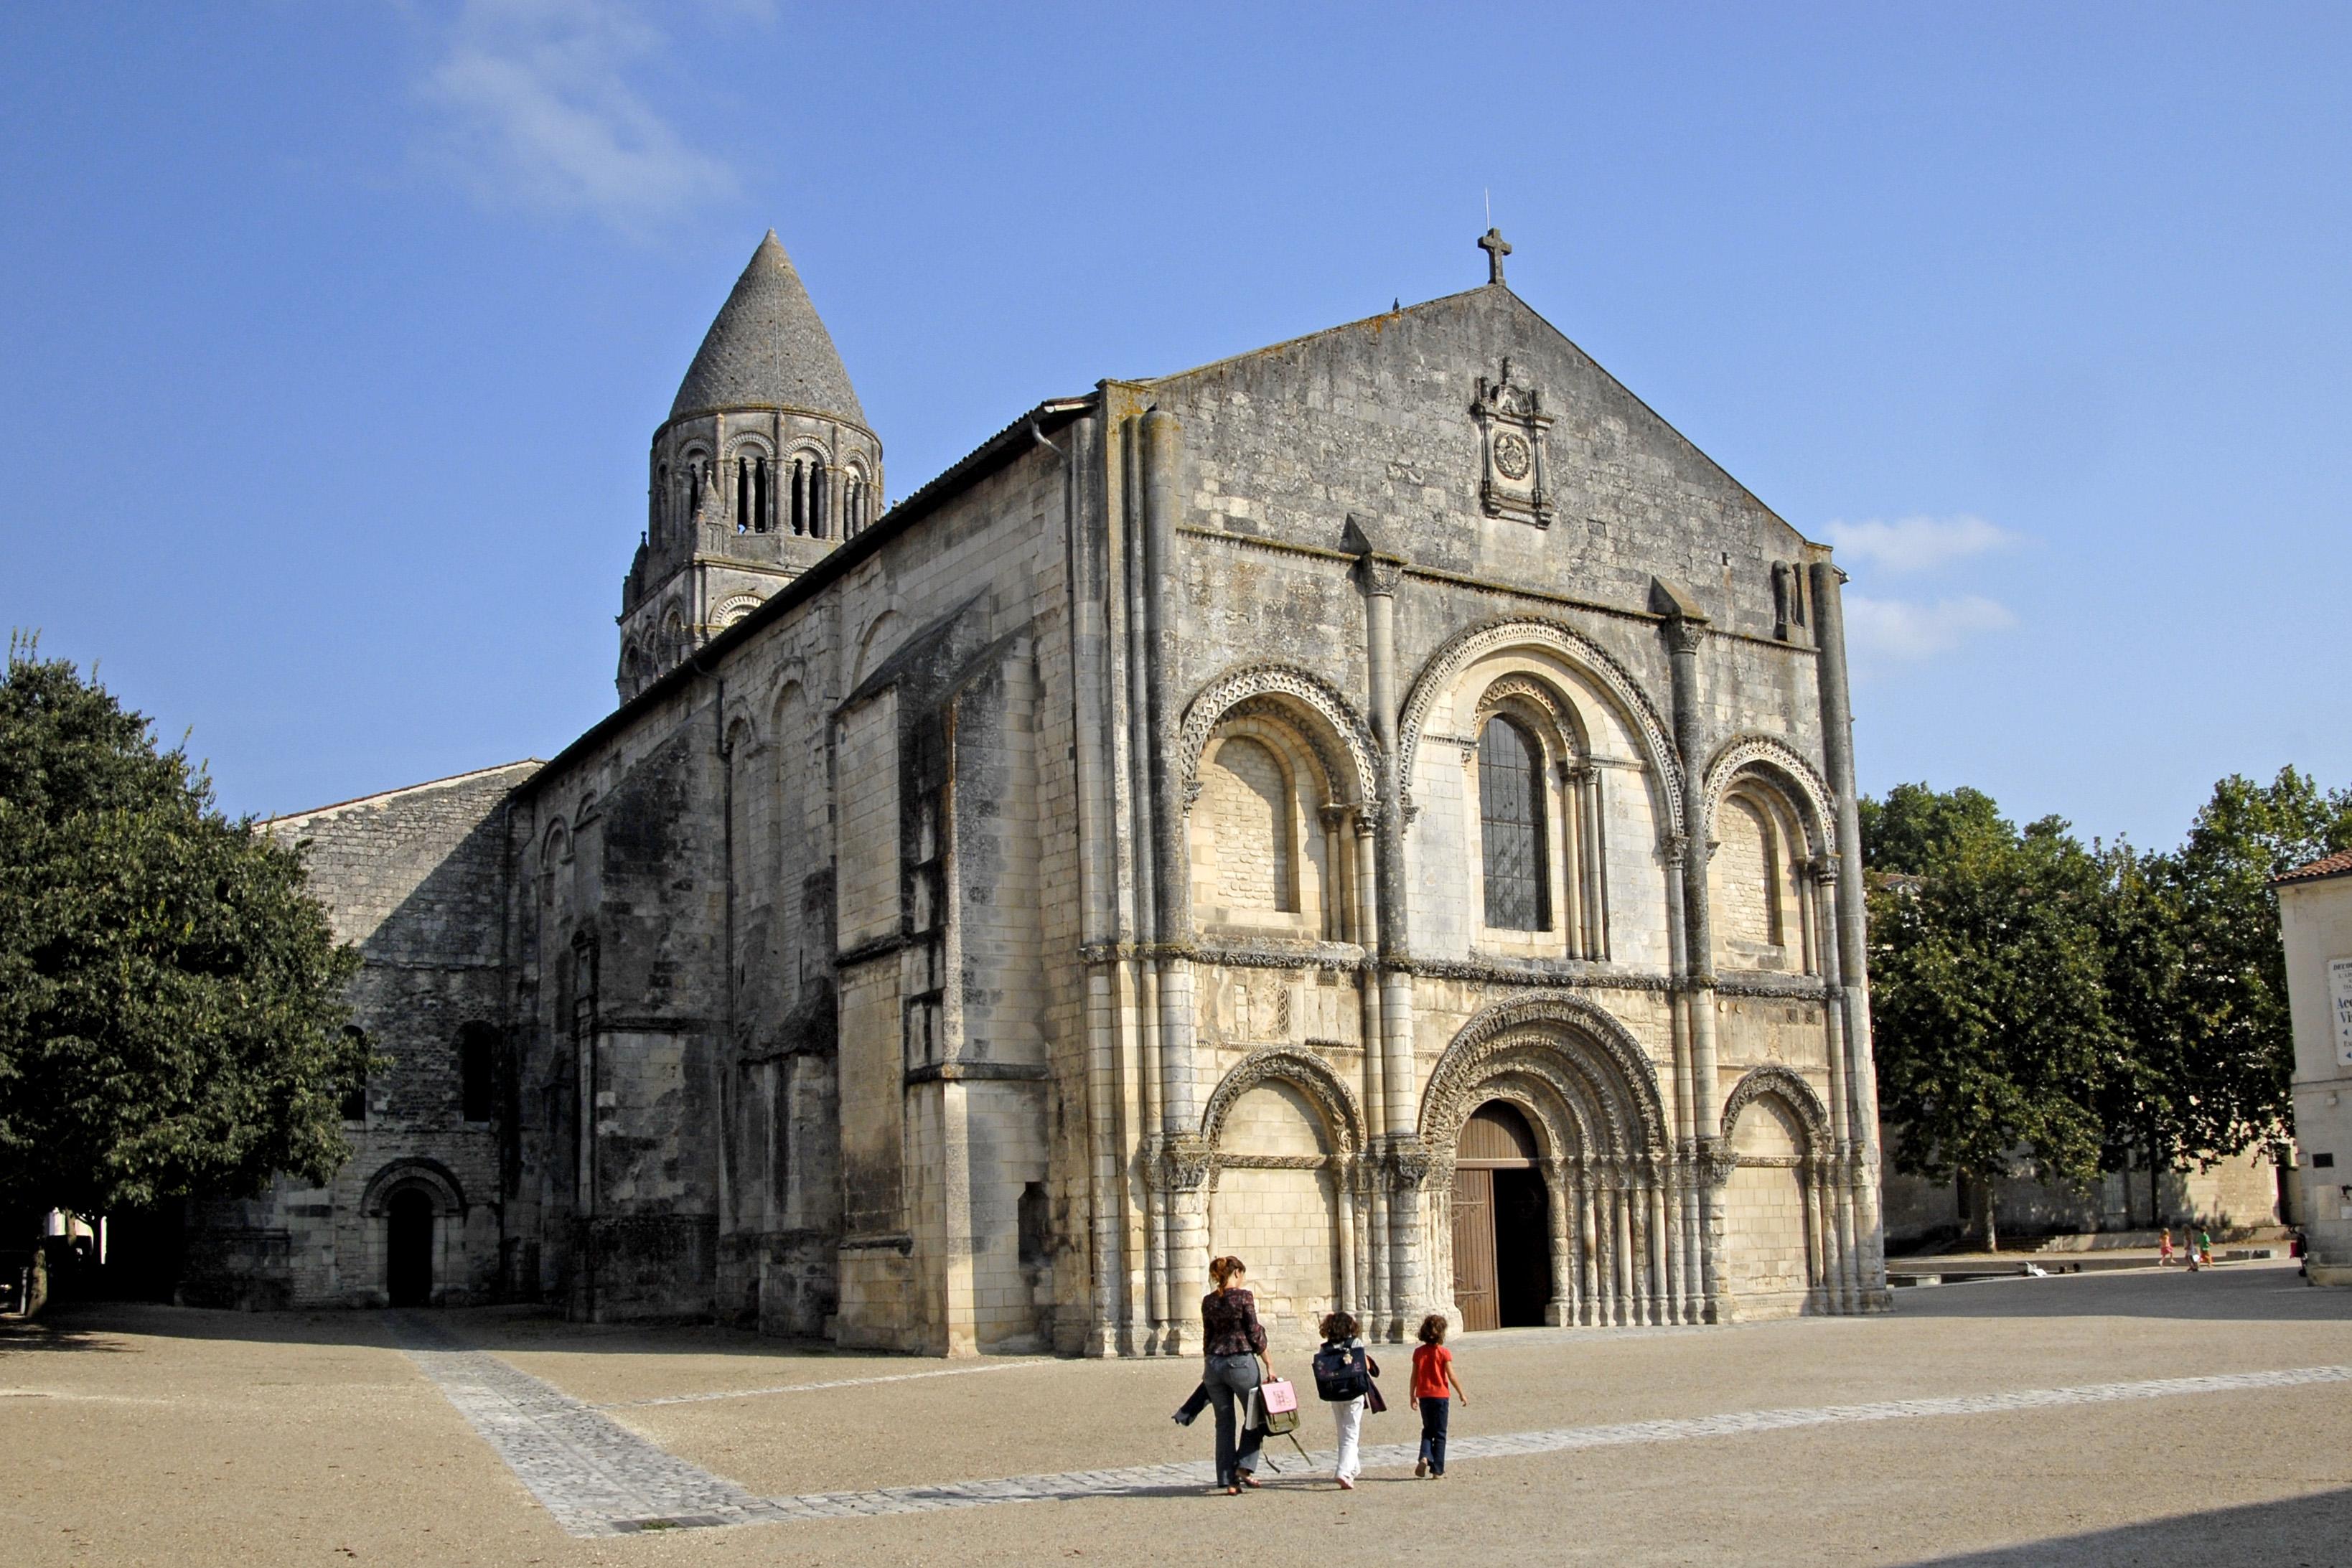 Ville De Saintes L Amphith Ef Bf Bd Ef Bf Bdtre Gallo Romain